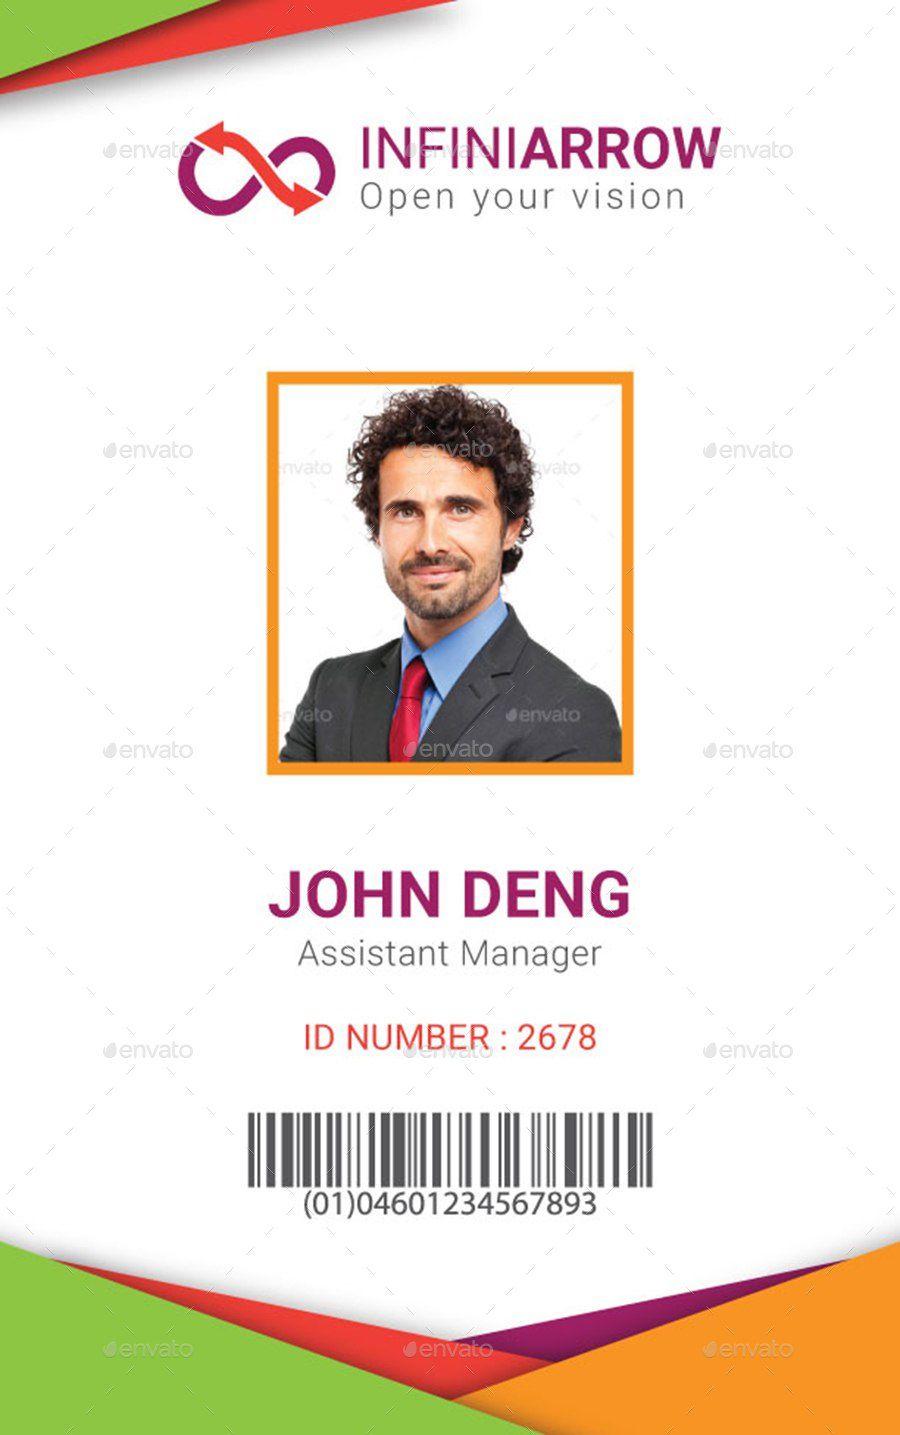 002 Frightening Id Badge Template Word Photo  Free EmployeeFull